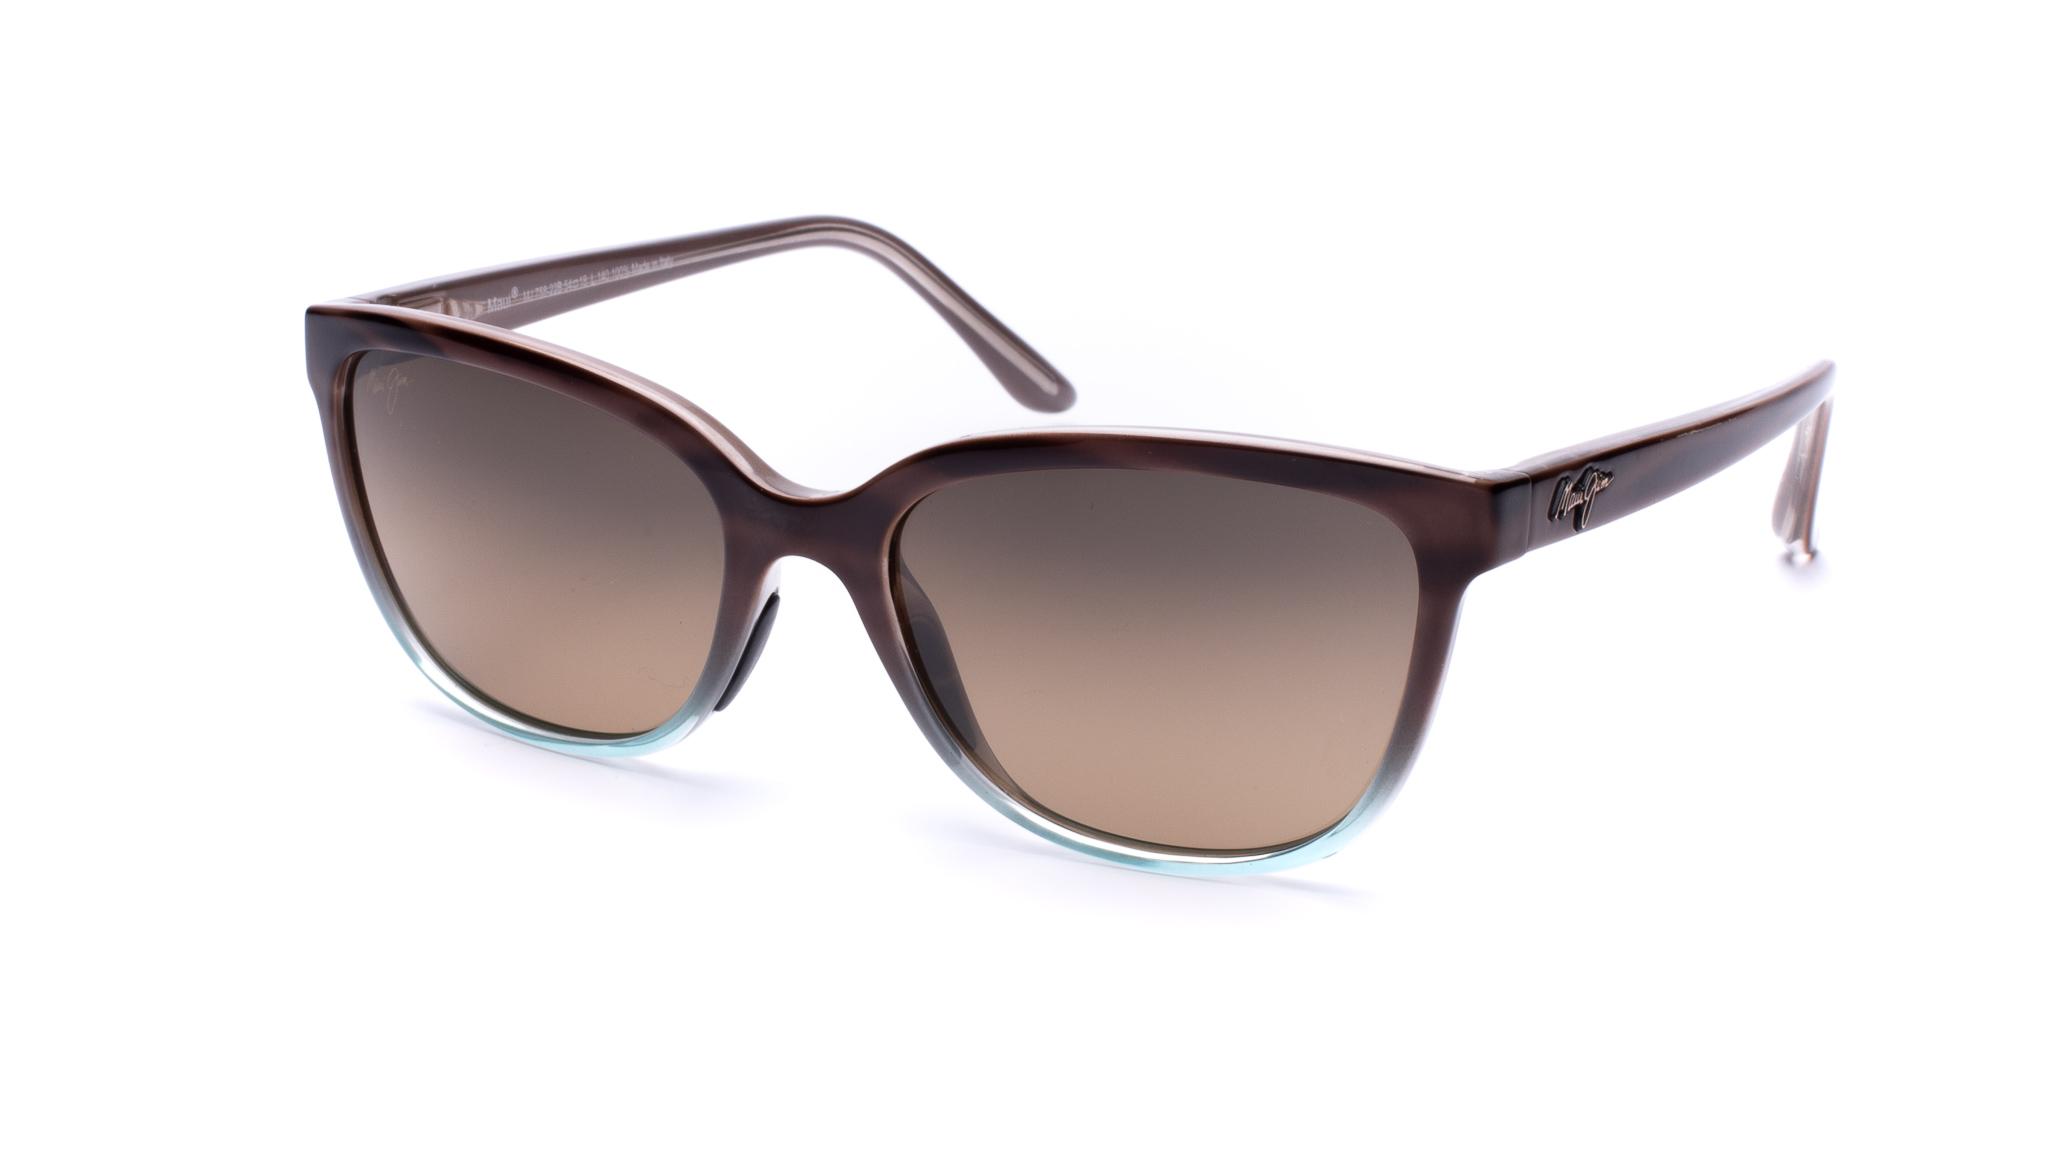 Maui Jim polarisierte Sonnenbrille